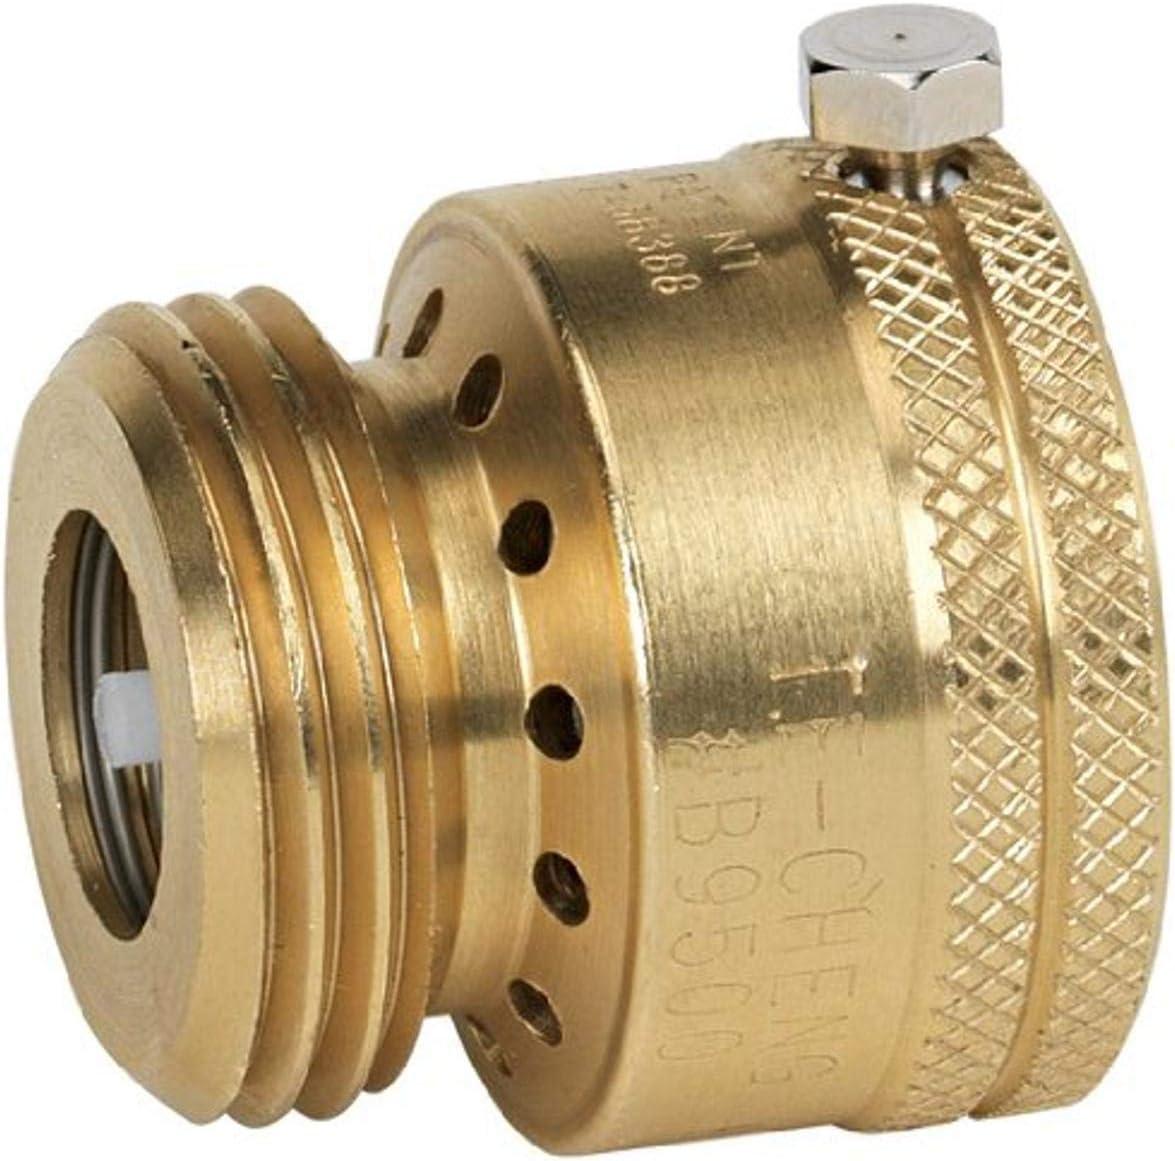 Homewerks Worldwide VACBFPZ4B Vacuum Breaker Hose Bib Backflow Preventer, 3/4 Inch, Brass Finish - Backflow Preventer -